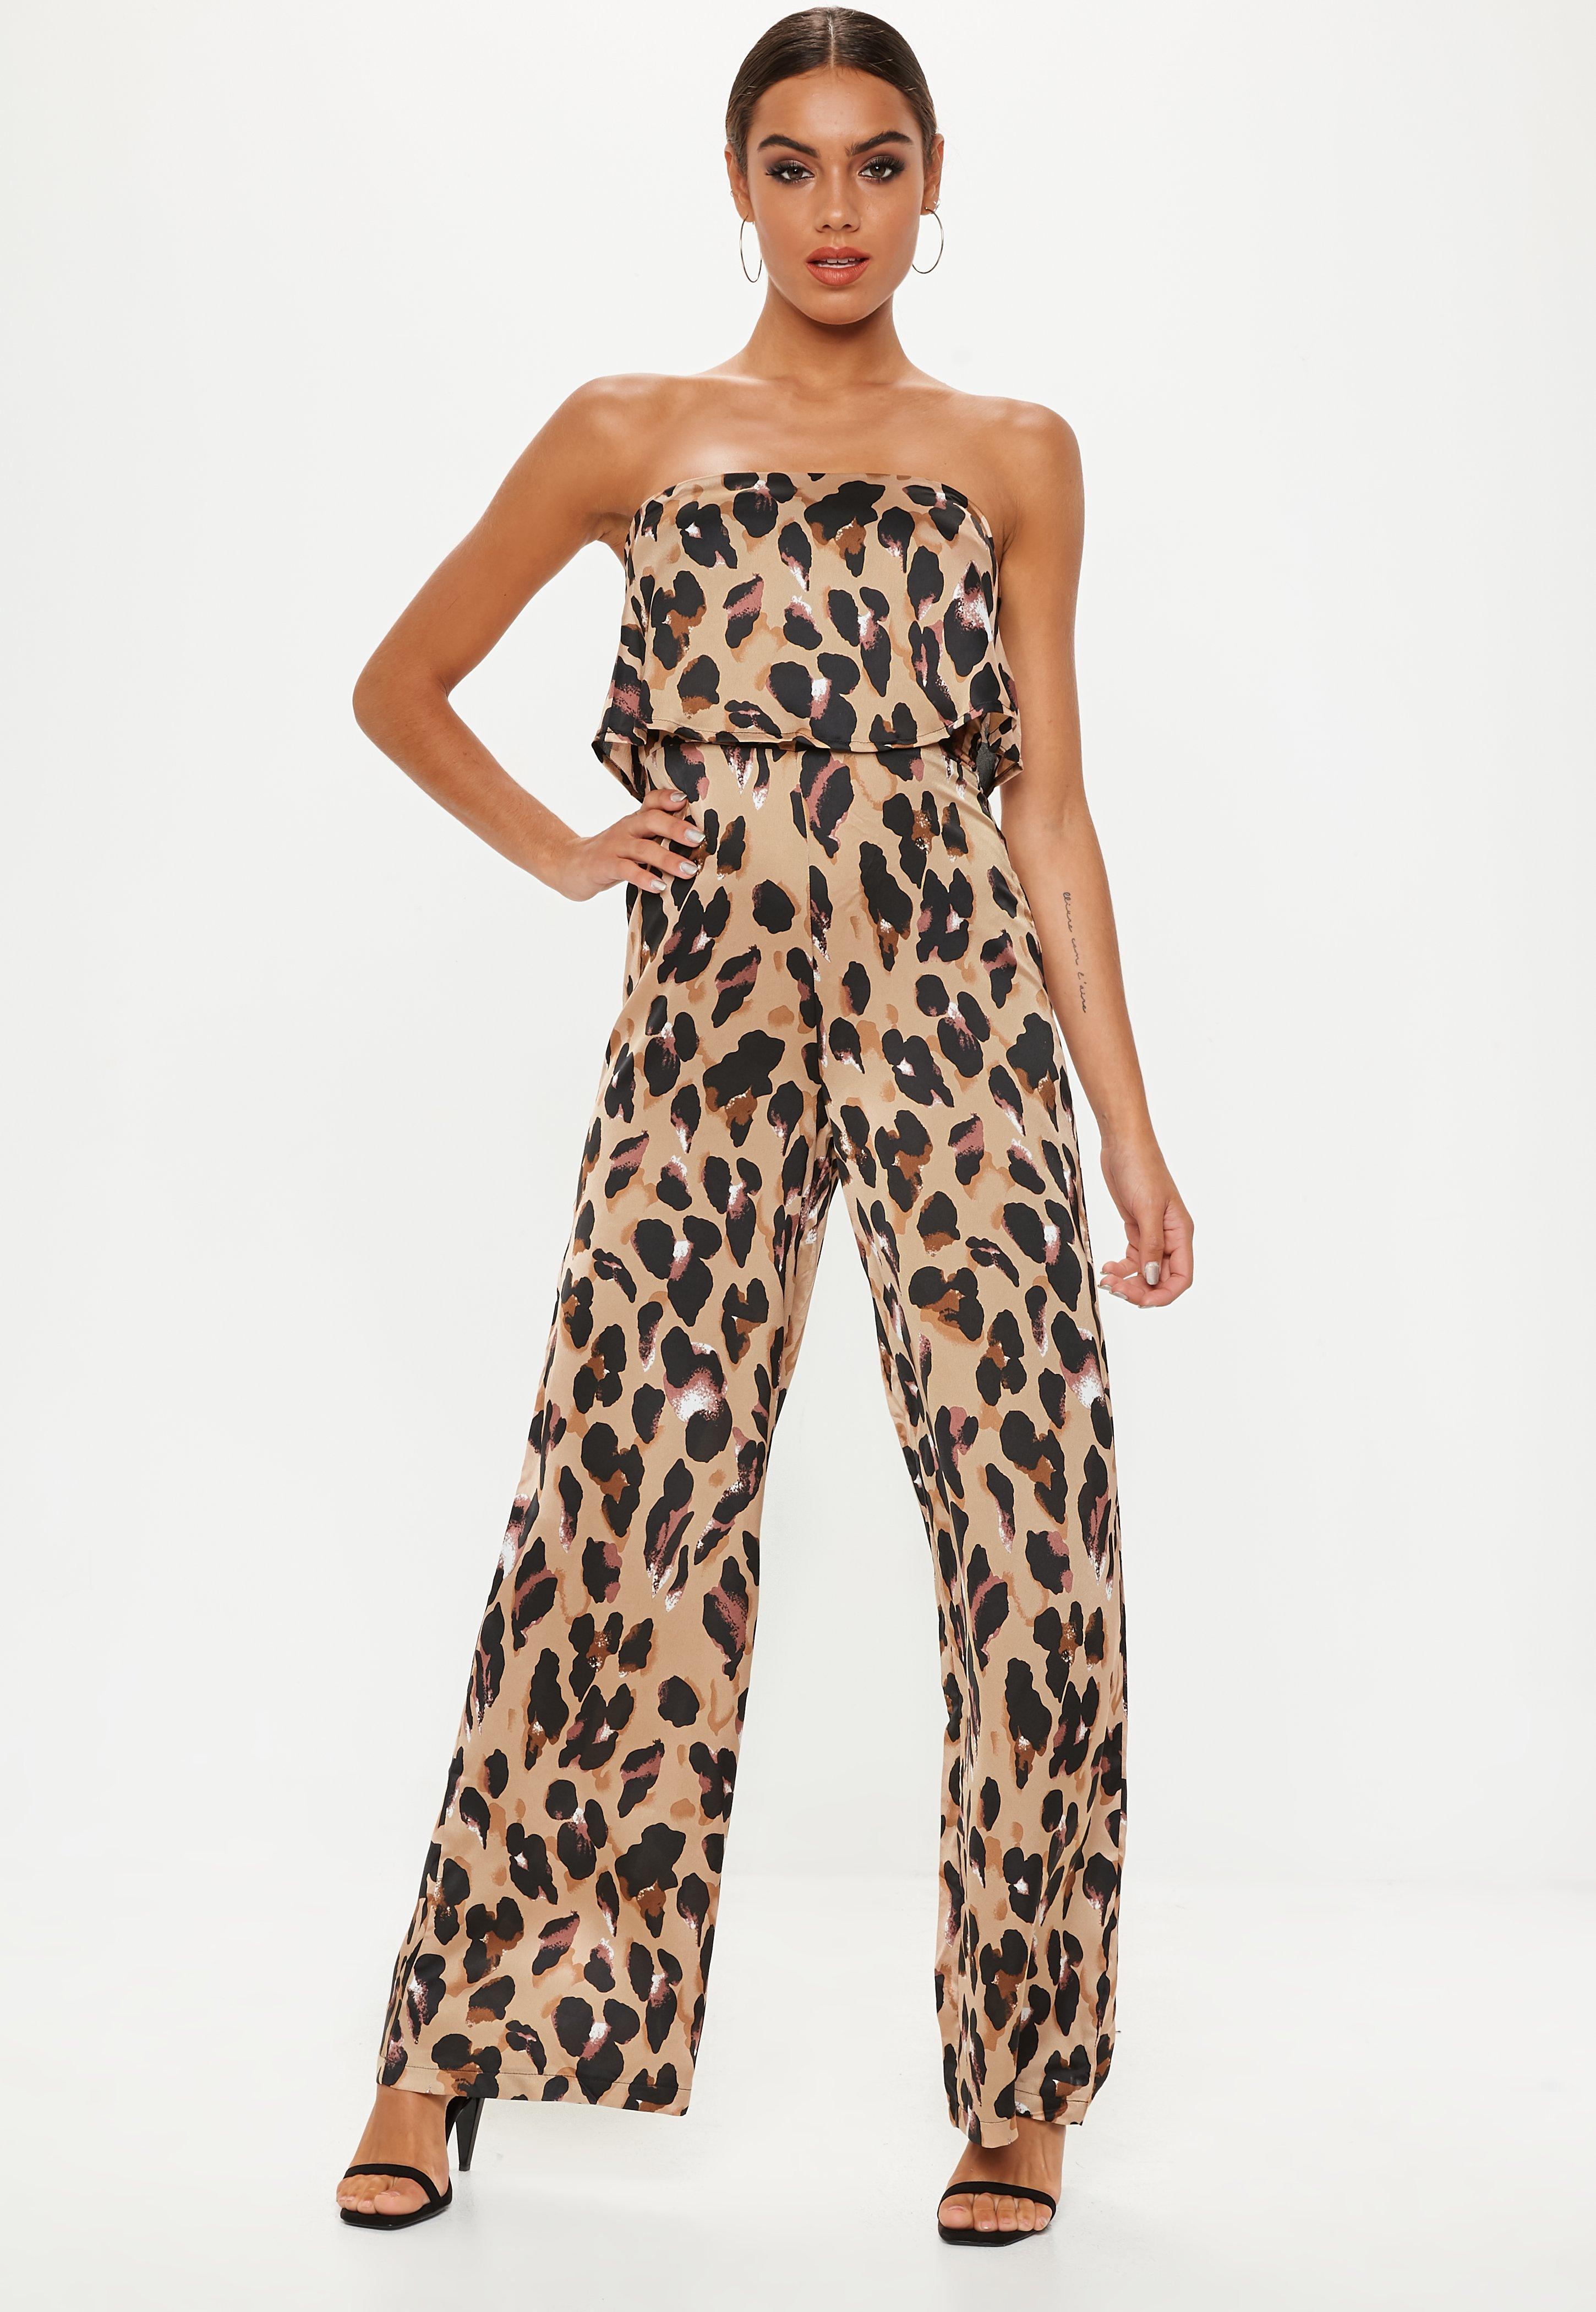 Animal Print Clothing | Animal Print Dresses & Tops - Missguided